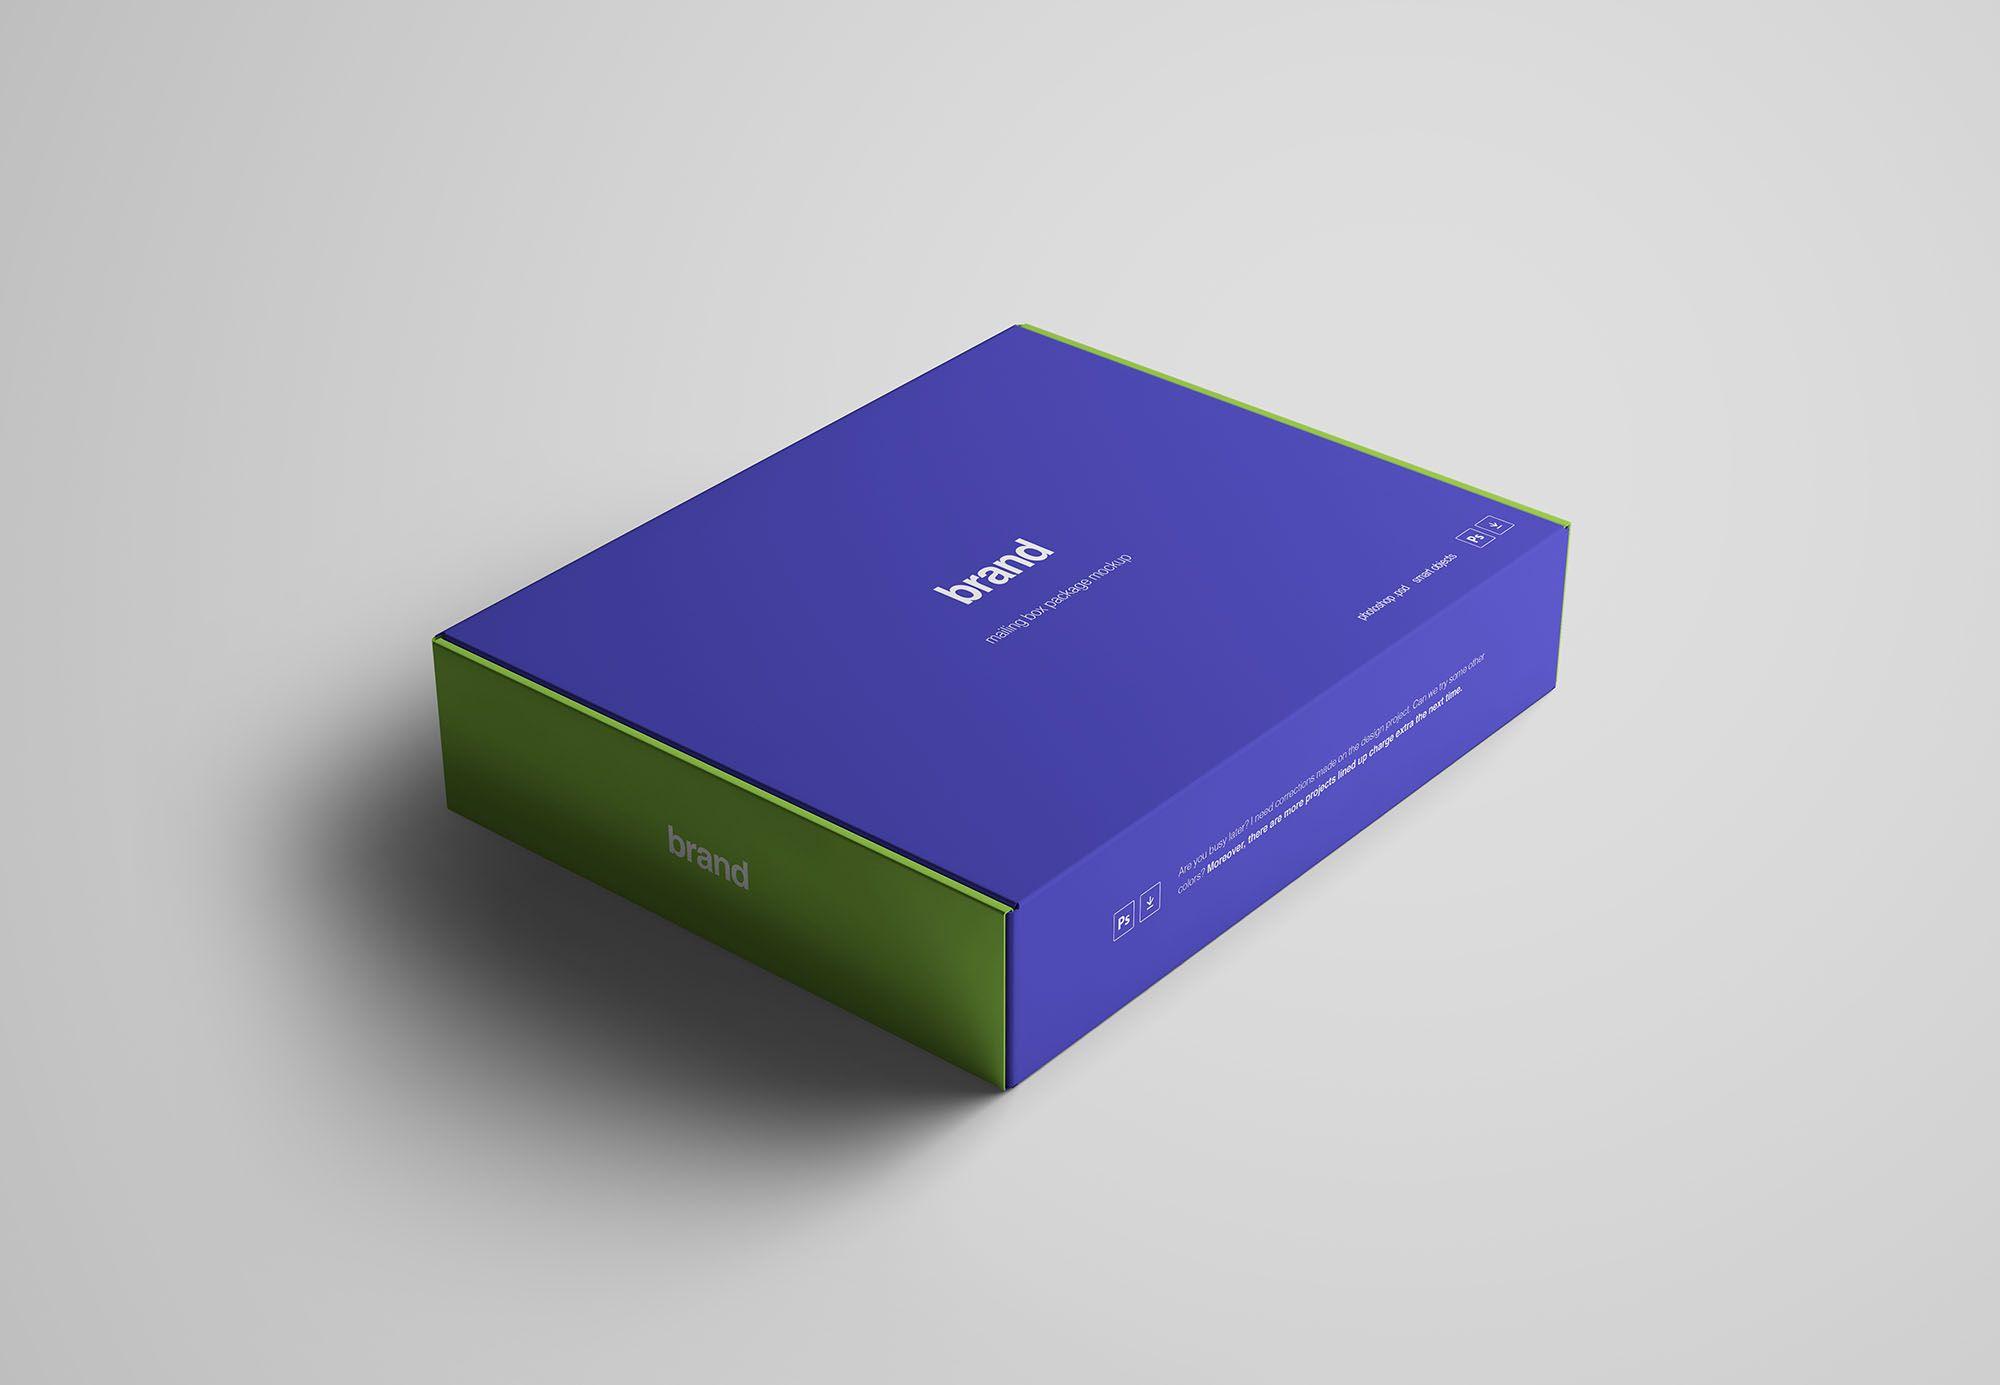 Advanced Package Box Mockup Box Mockup Box Packaging Packaging